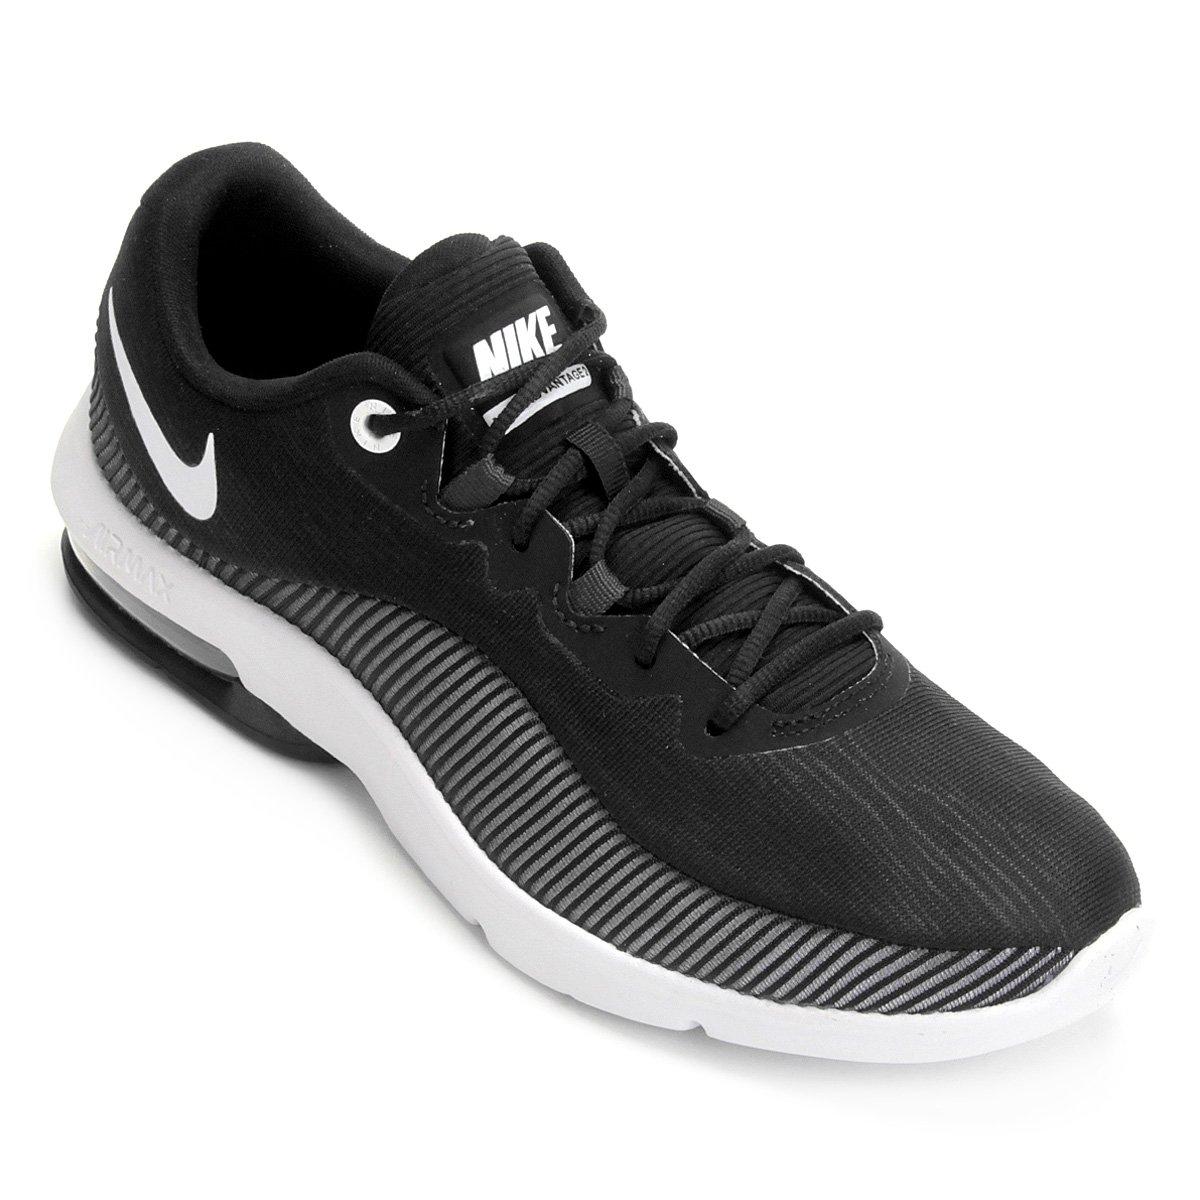 Menor preço em Tênis Nike Wmns Air Max Advantage 2 Preto